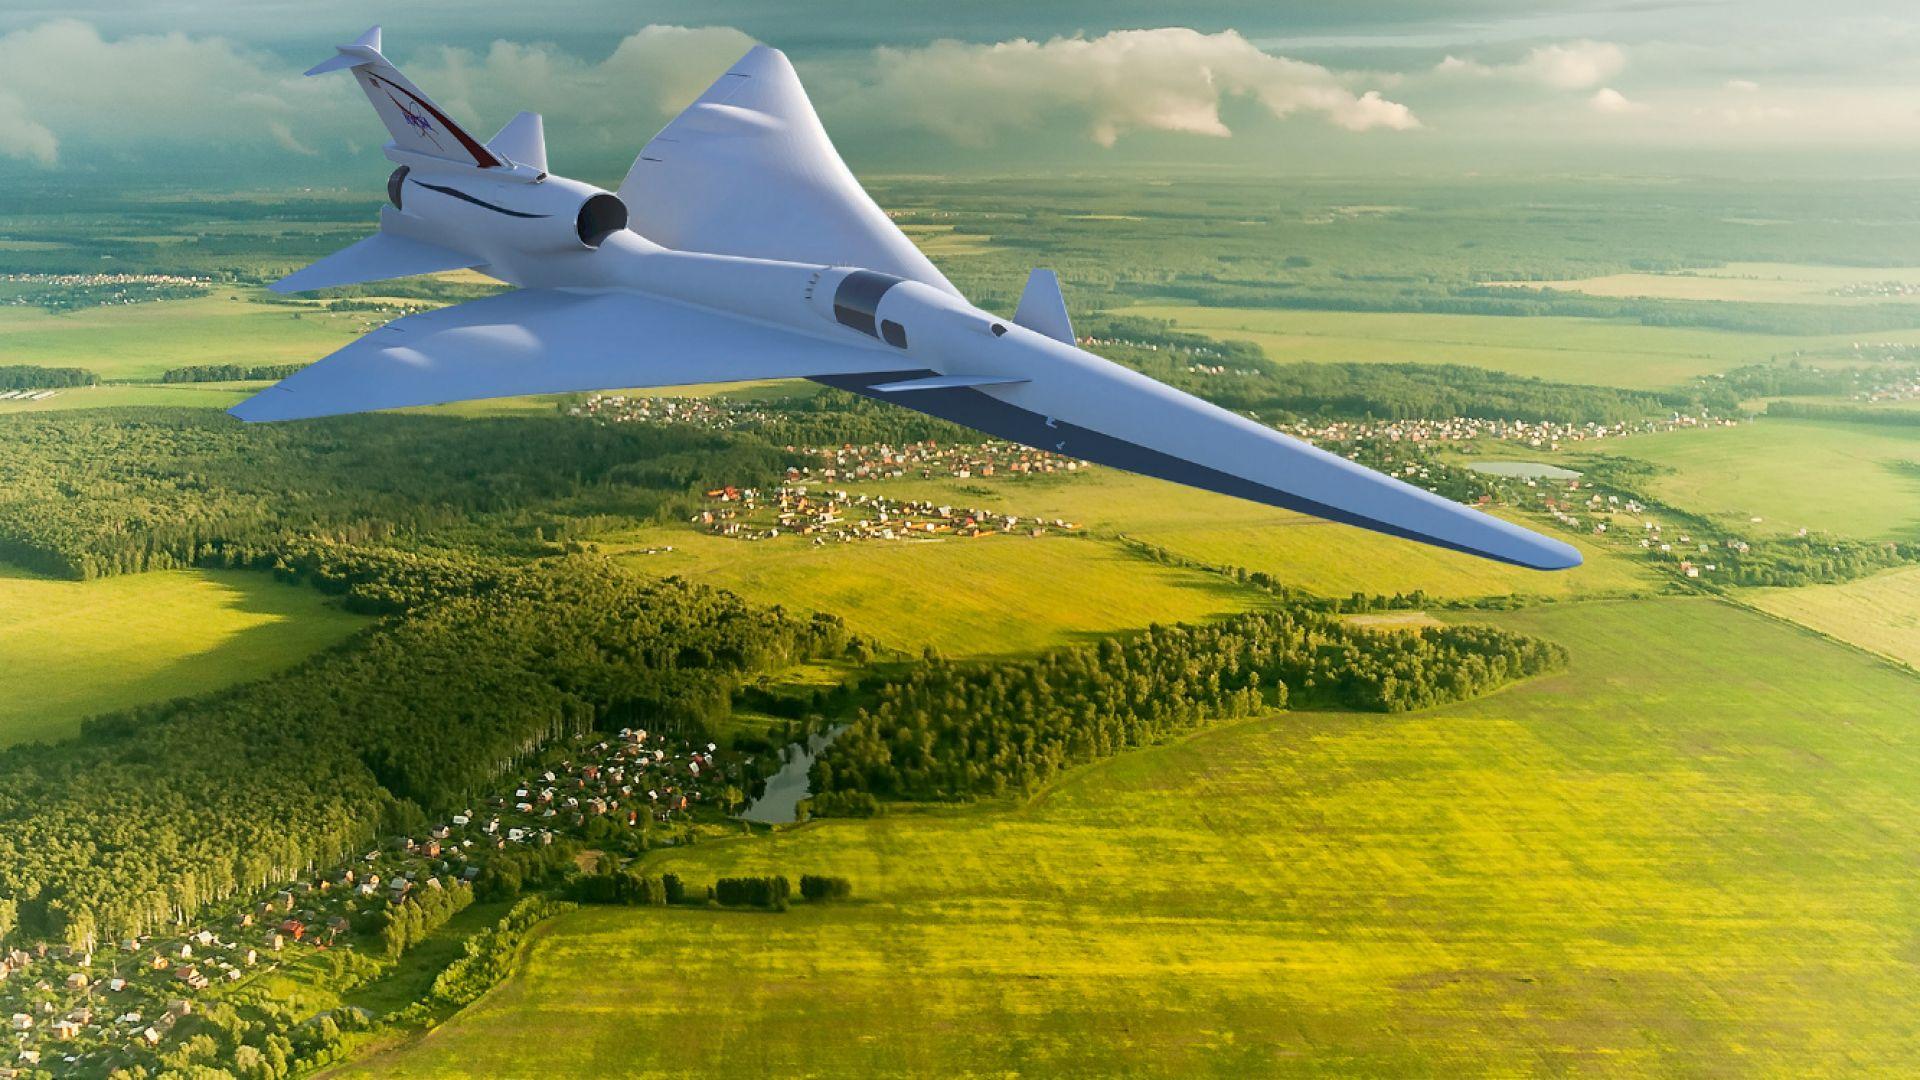 НАСА заменя прозореца на свръхзвуков самолет с екран